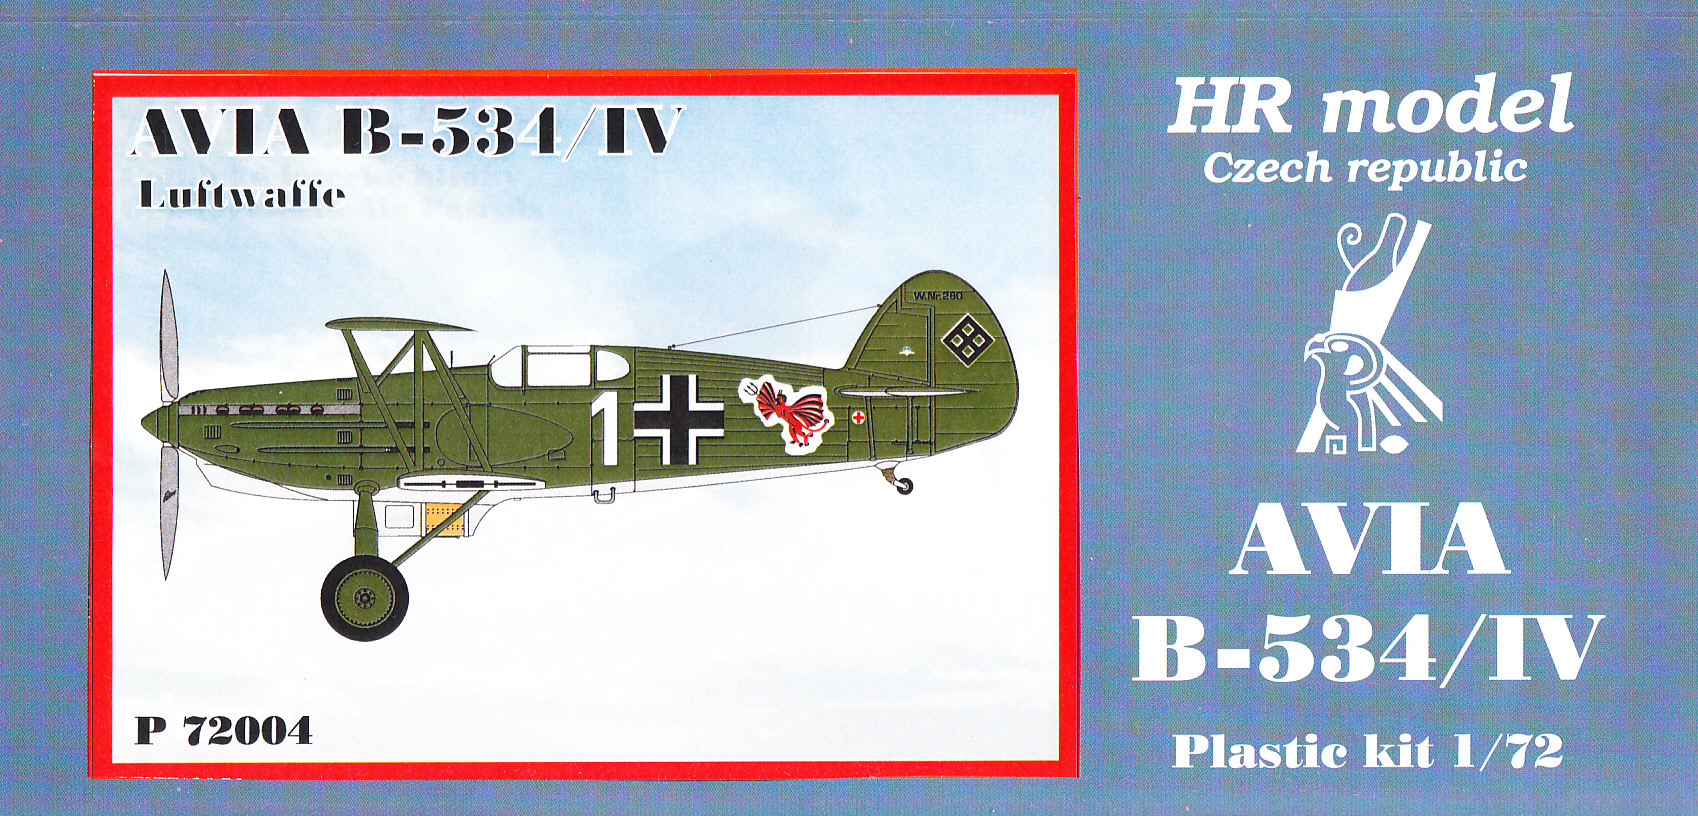 1 Hr Photo >> HR model Cz - Avia B 534 IV